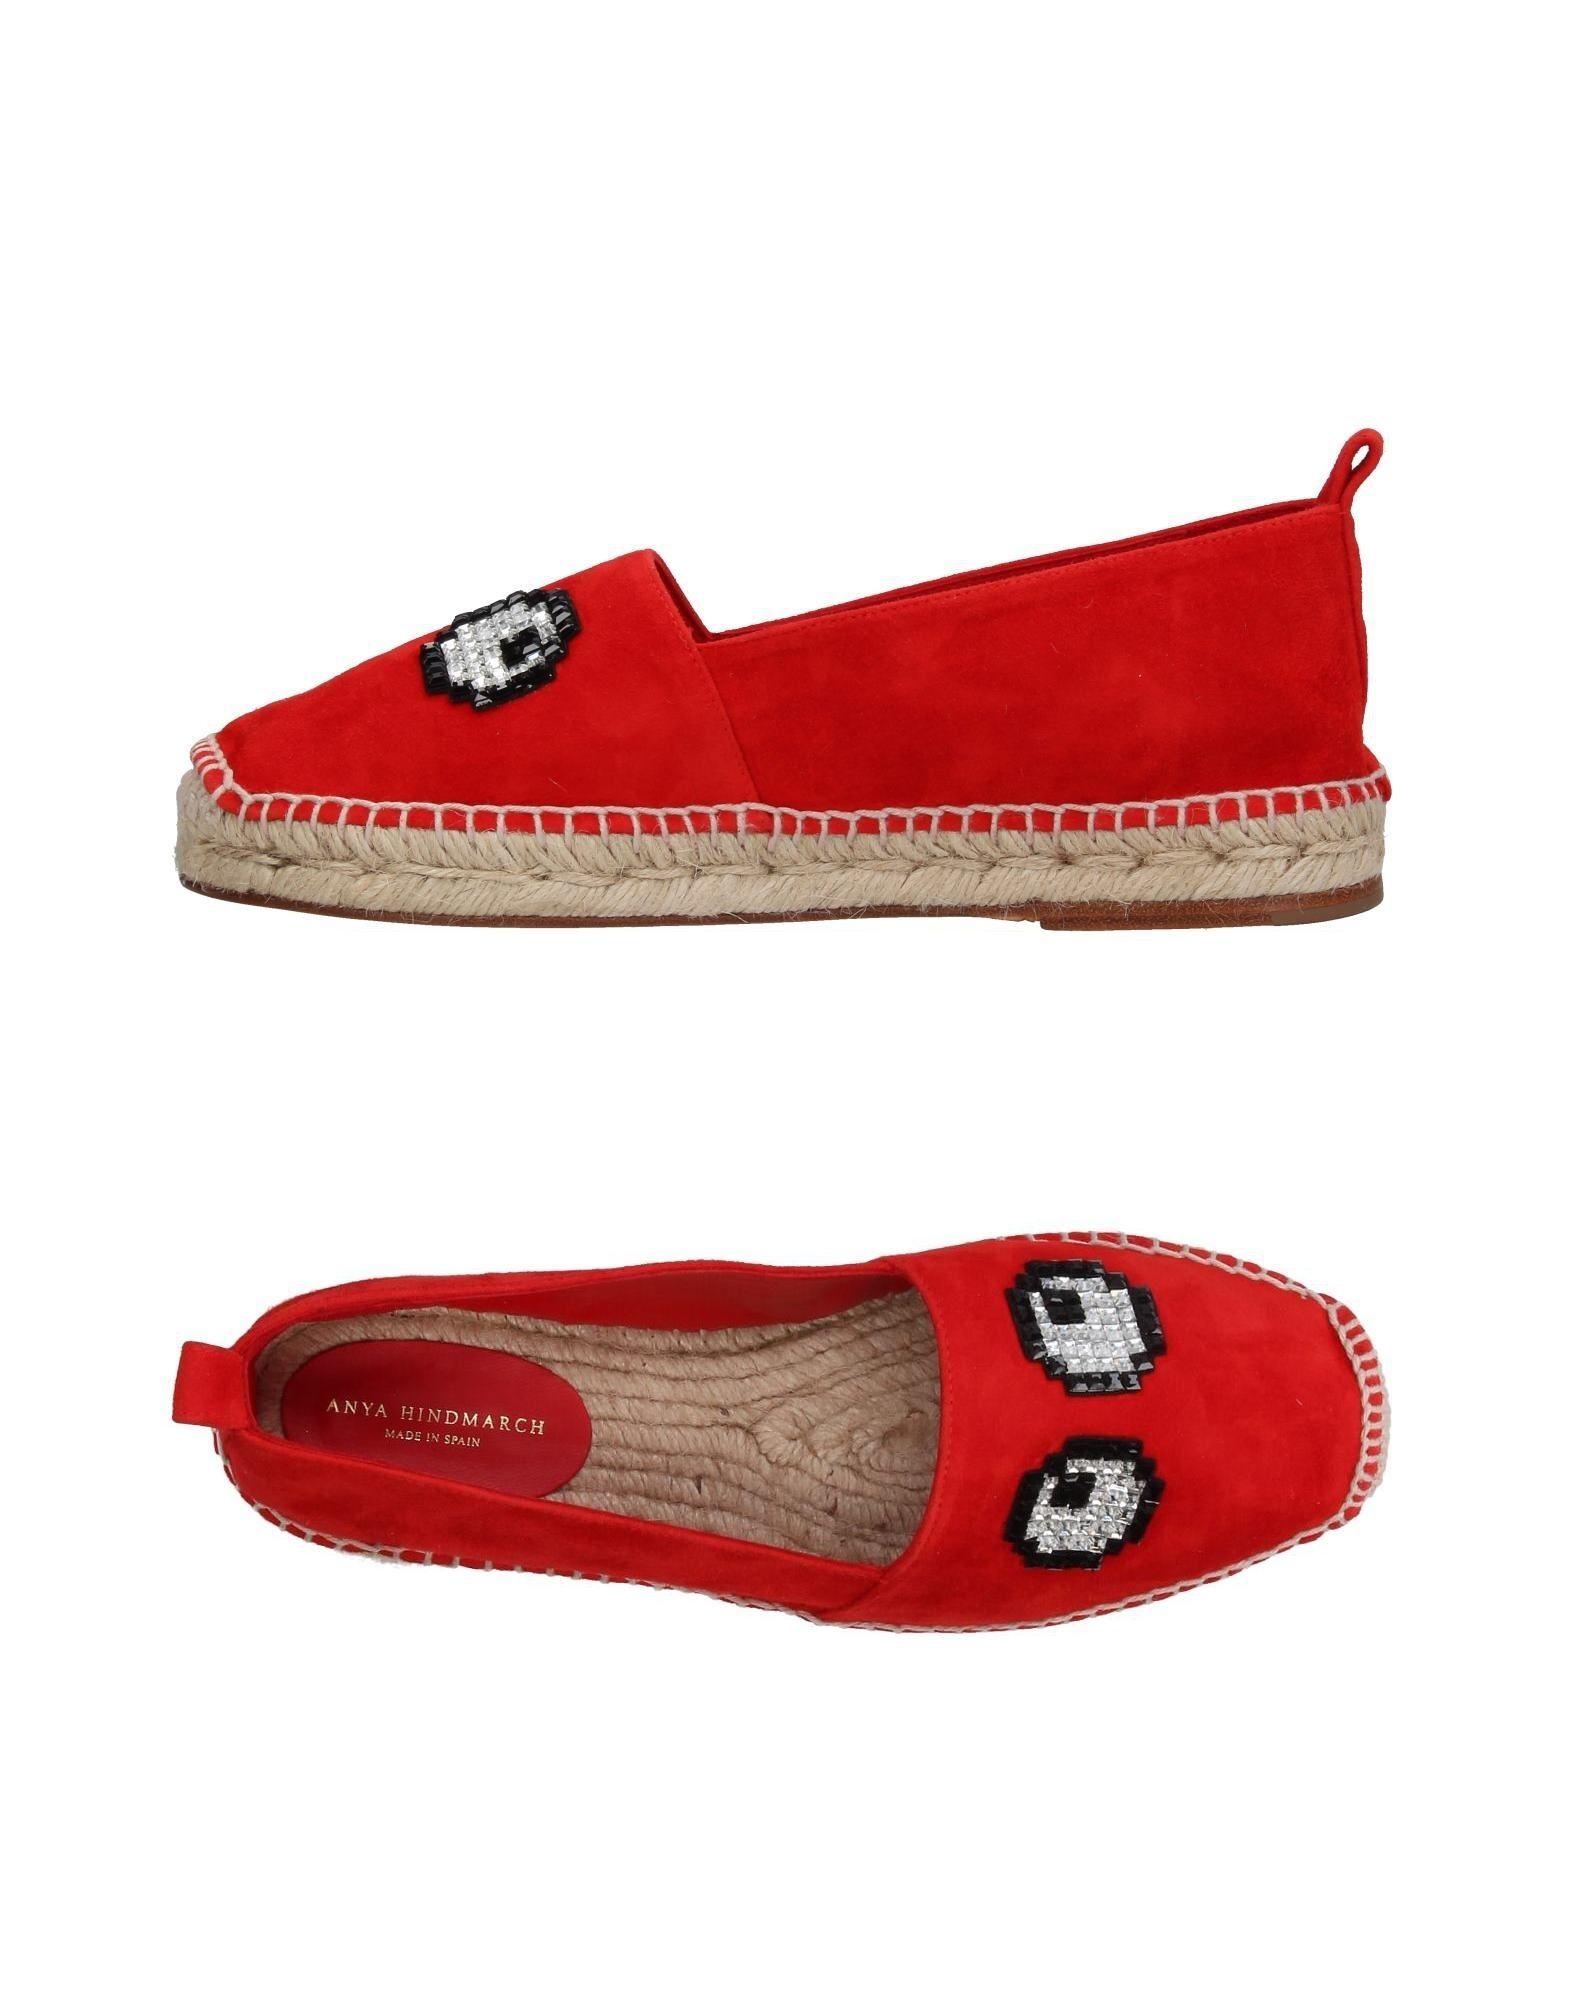 Anya Hindmarch Espadrilles 11383996UVGut Damen  11383996UVGut Espadrilles aussehende strapazierfähige Schuhe 0145b8